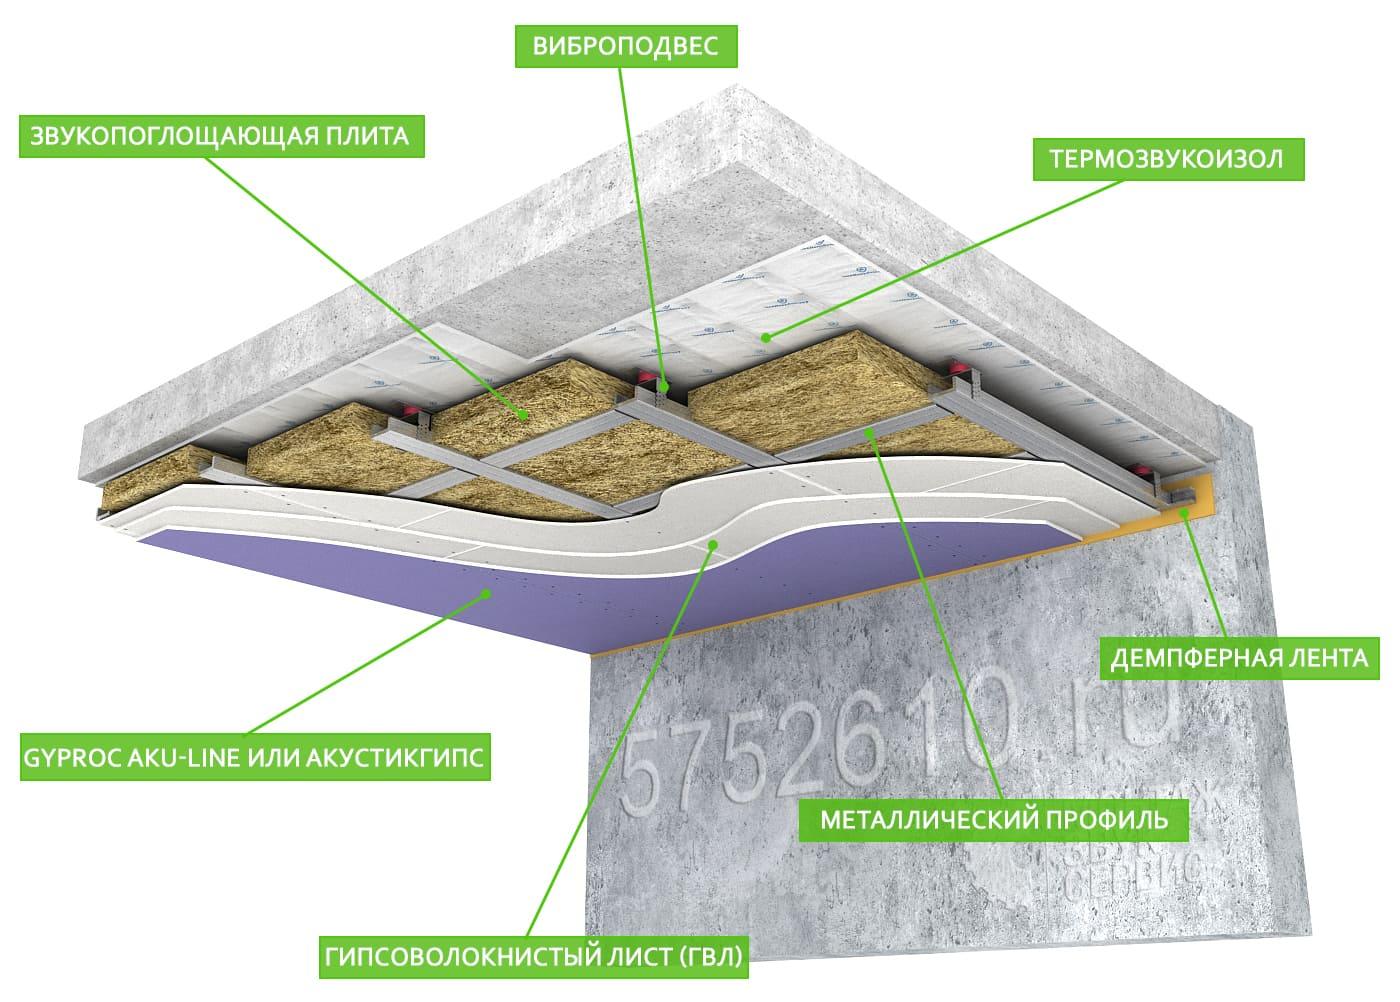 Звукоизоляция потолка от соседей сверху в квартире